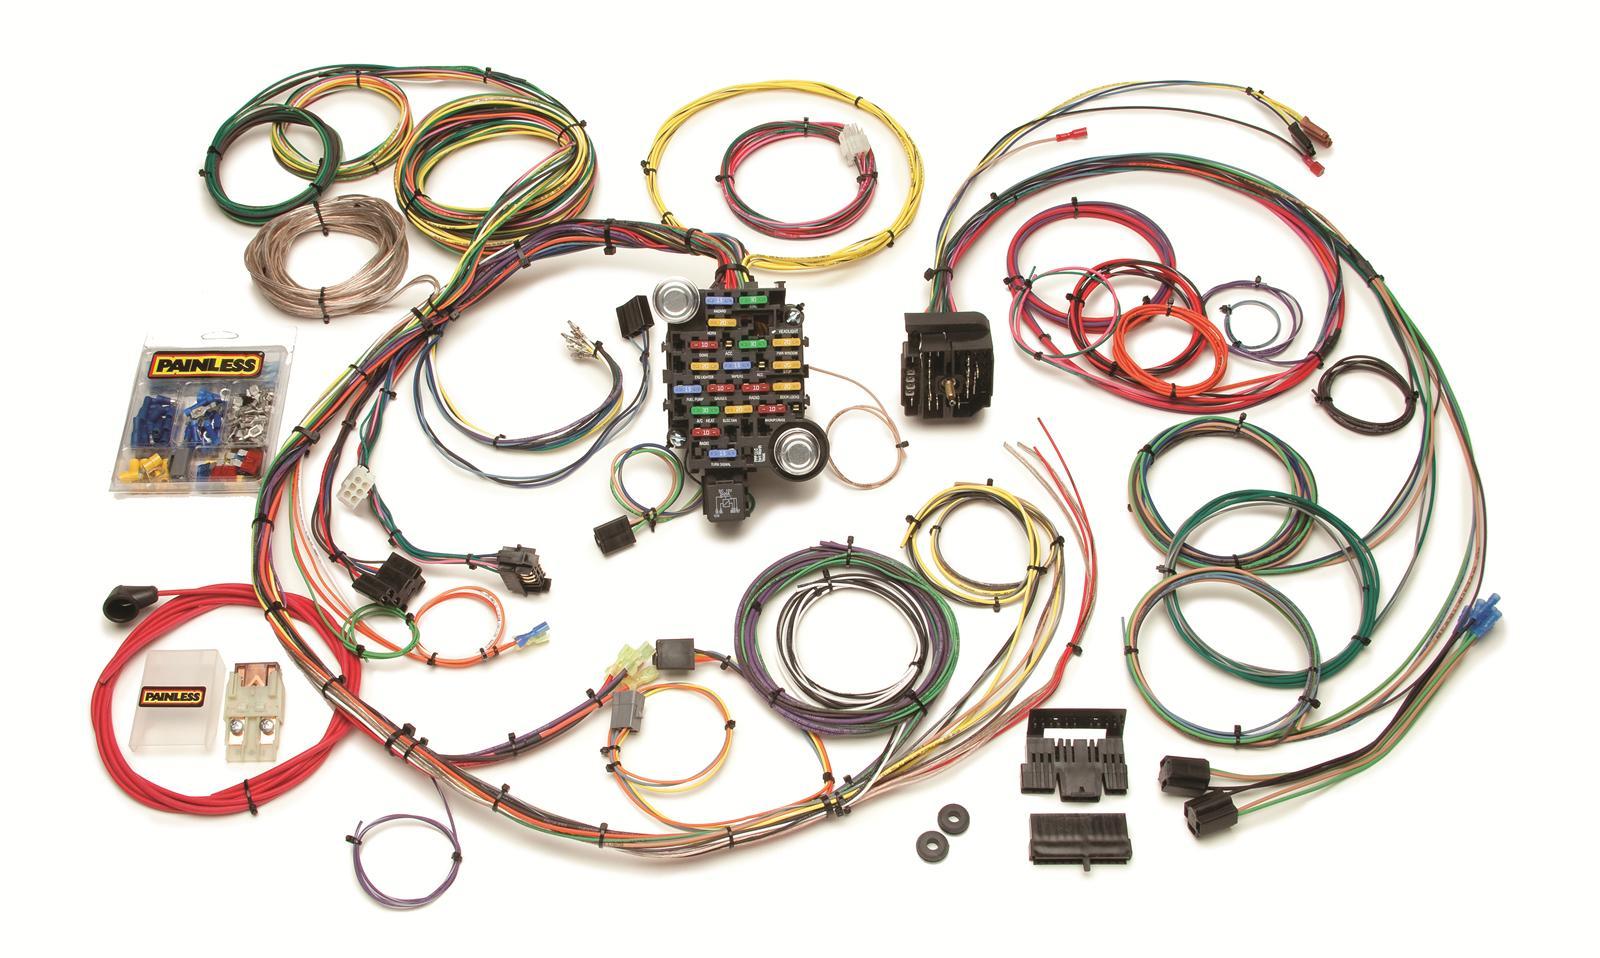 1969 firebird dash wiring diagram ford focus 2005 painless performance 24 circuit 1967 68 camaro and